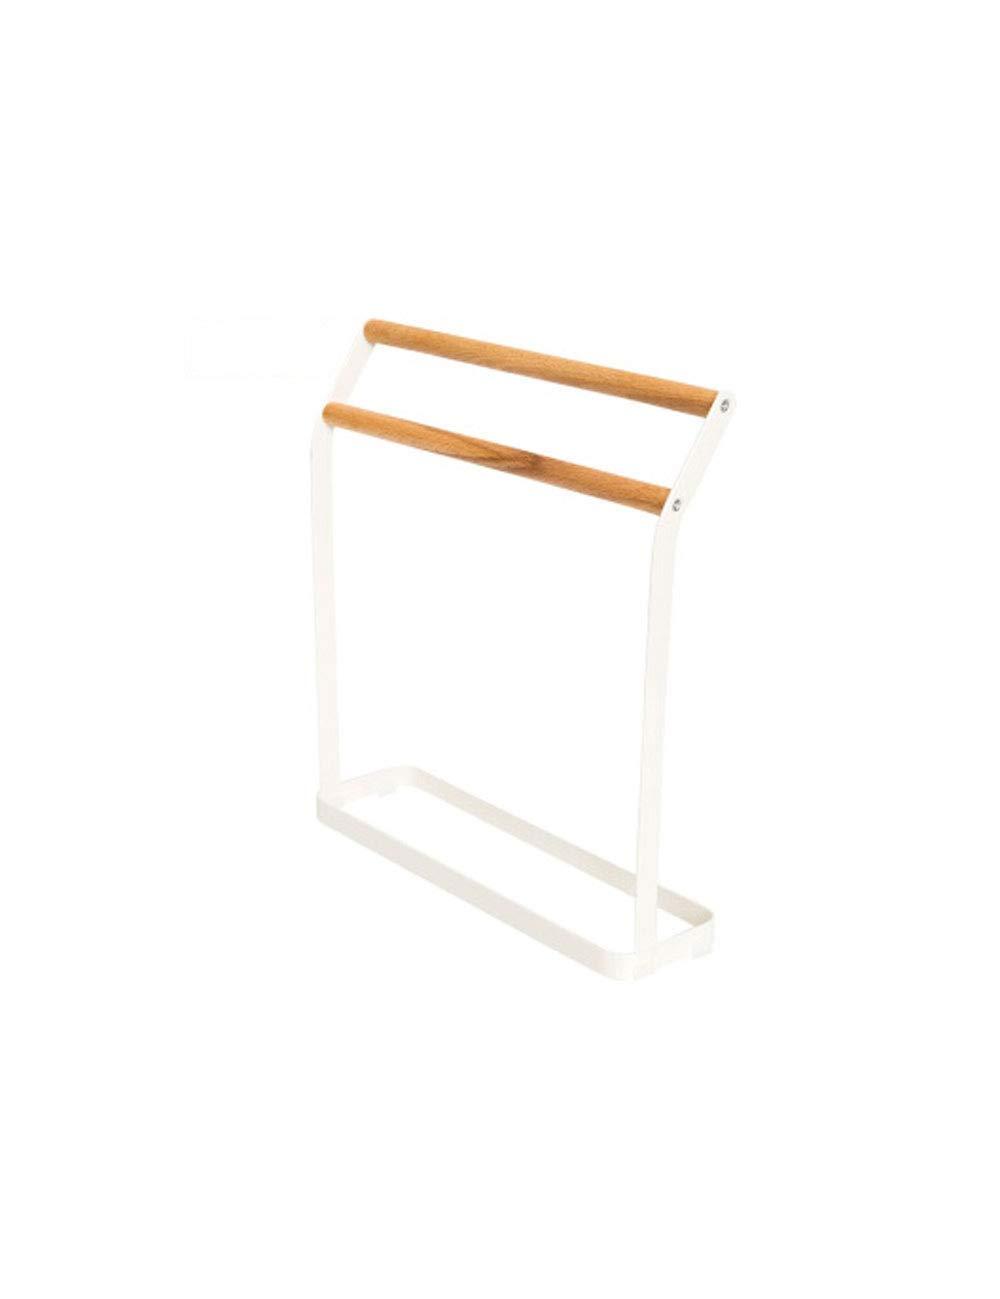 AKMQBZ Free Punching, Bathroom Towel Rack Bathroom Vertical Wrought Iron + Wood Pole, Length 28.5CM Width 8.1CM Height 31.3CM